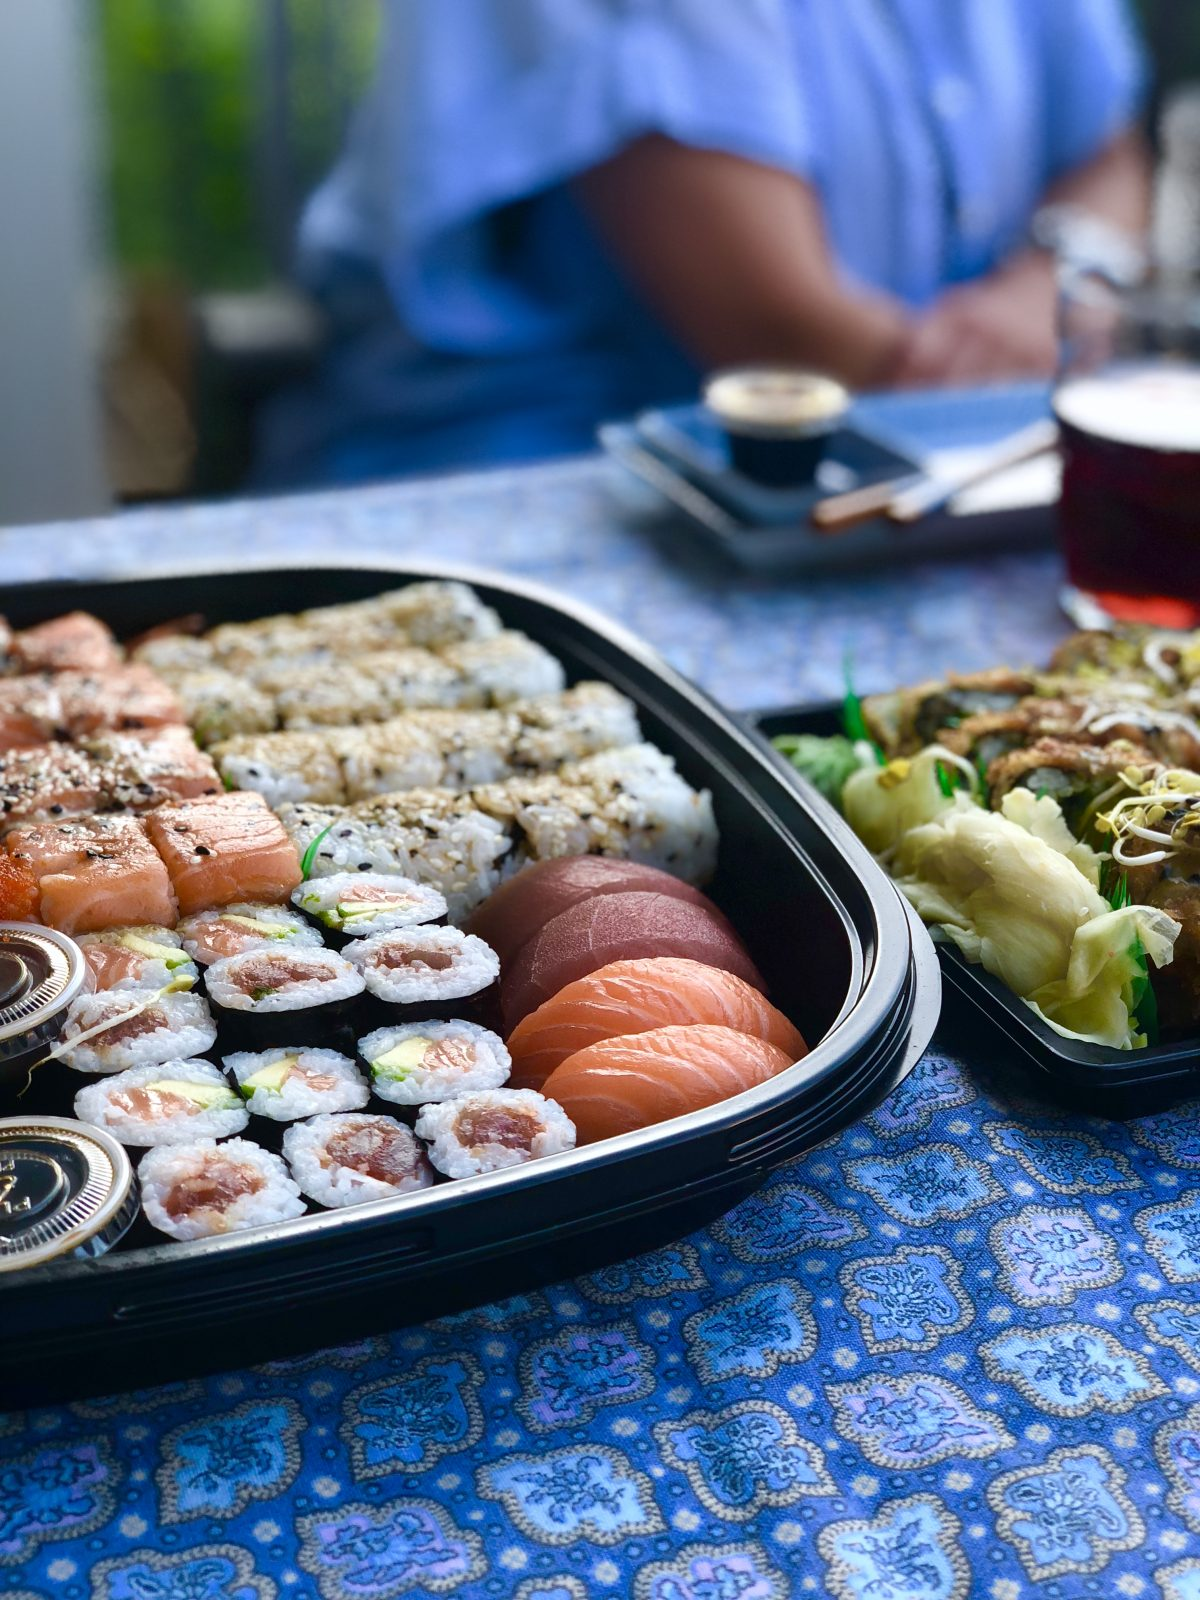 Freitagslieblinge: Sushi auf dem Balkon | berlinmittemom.com